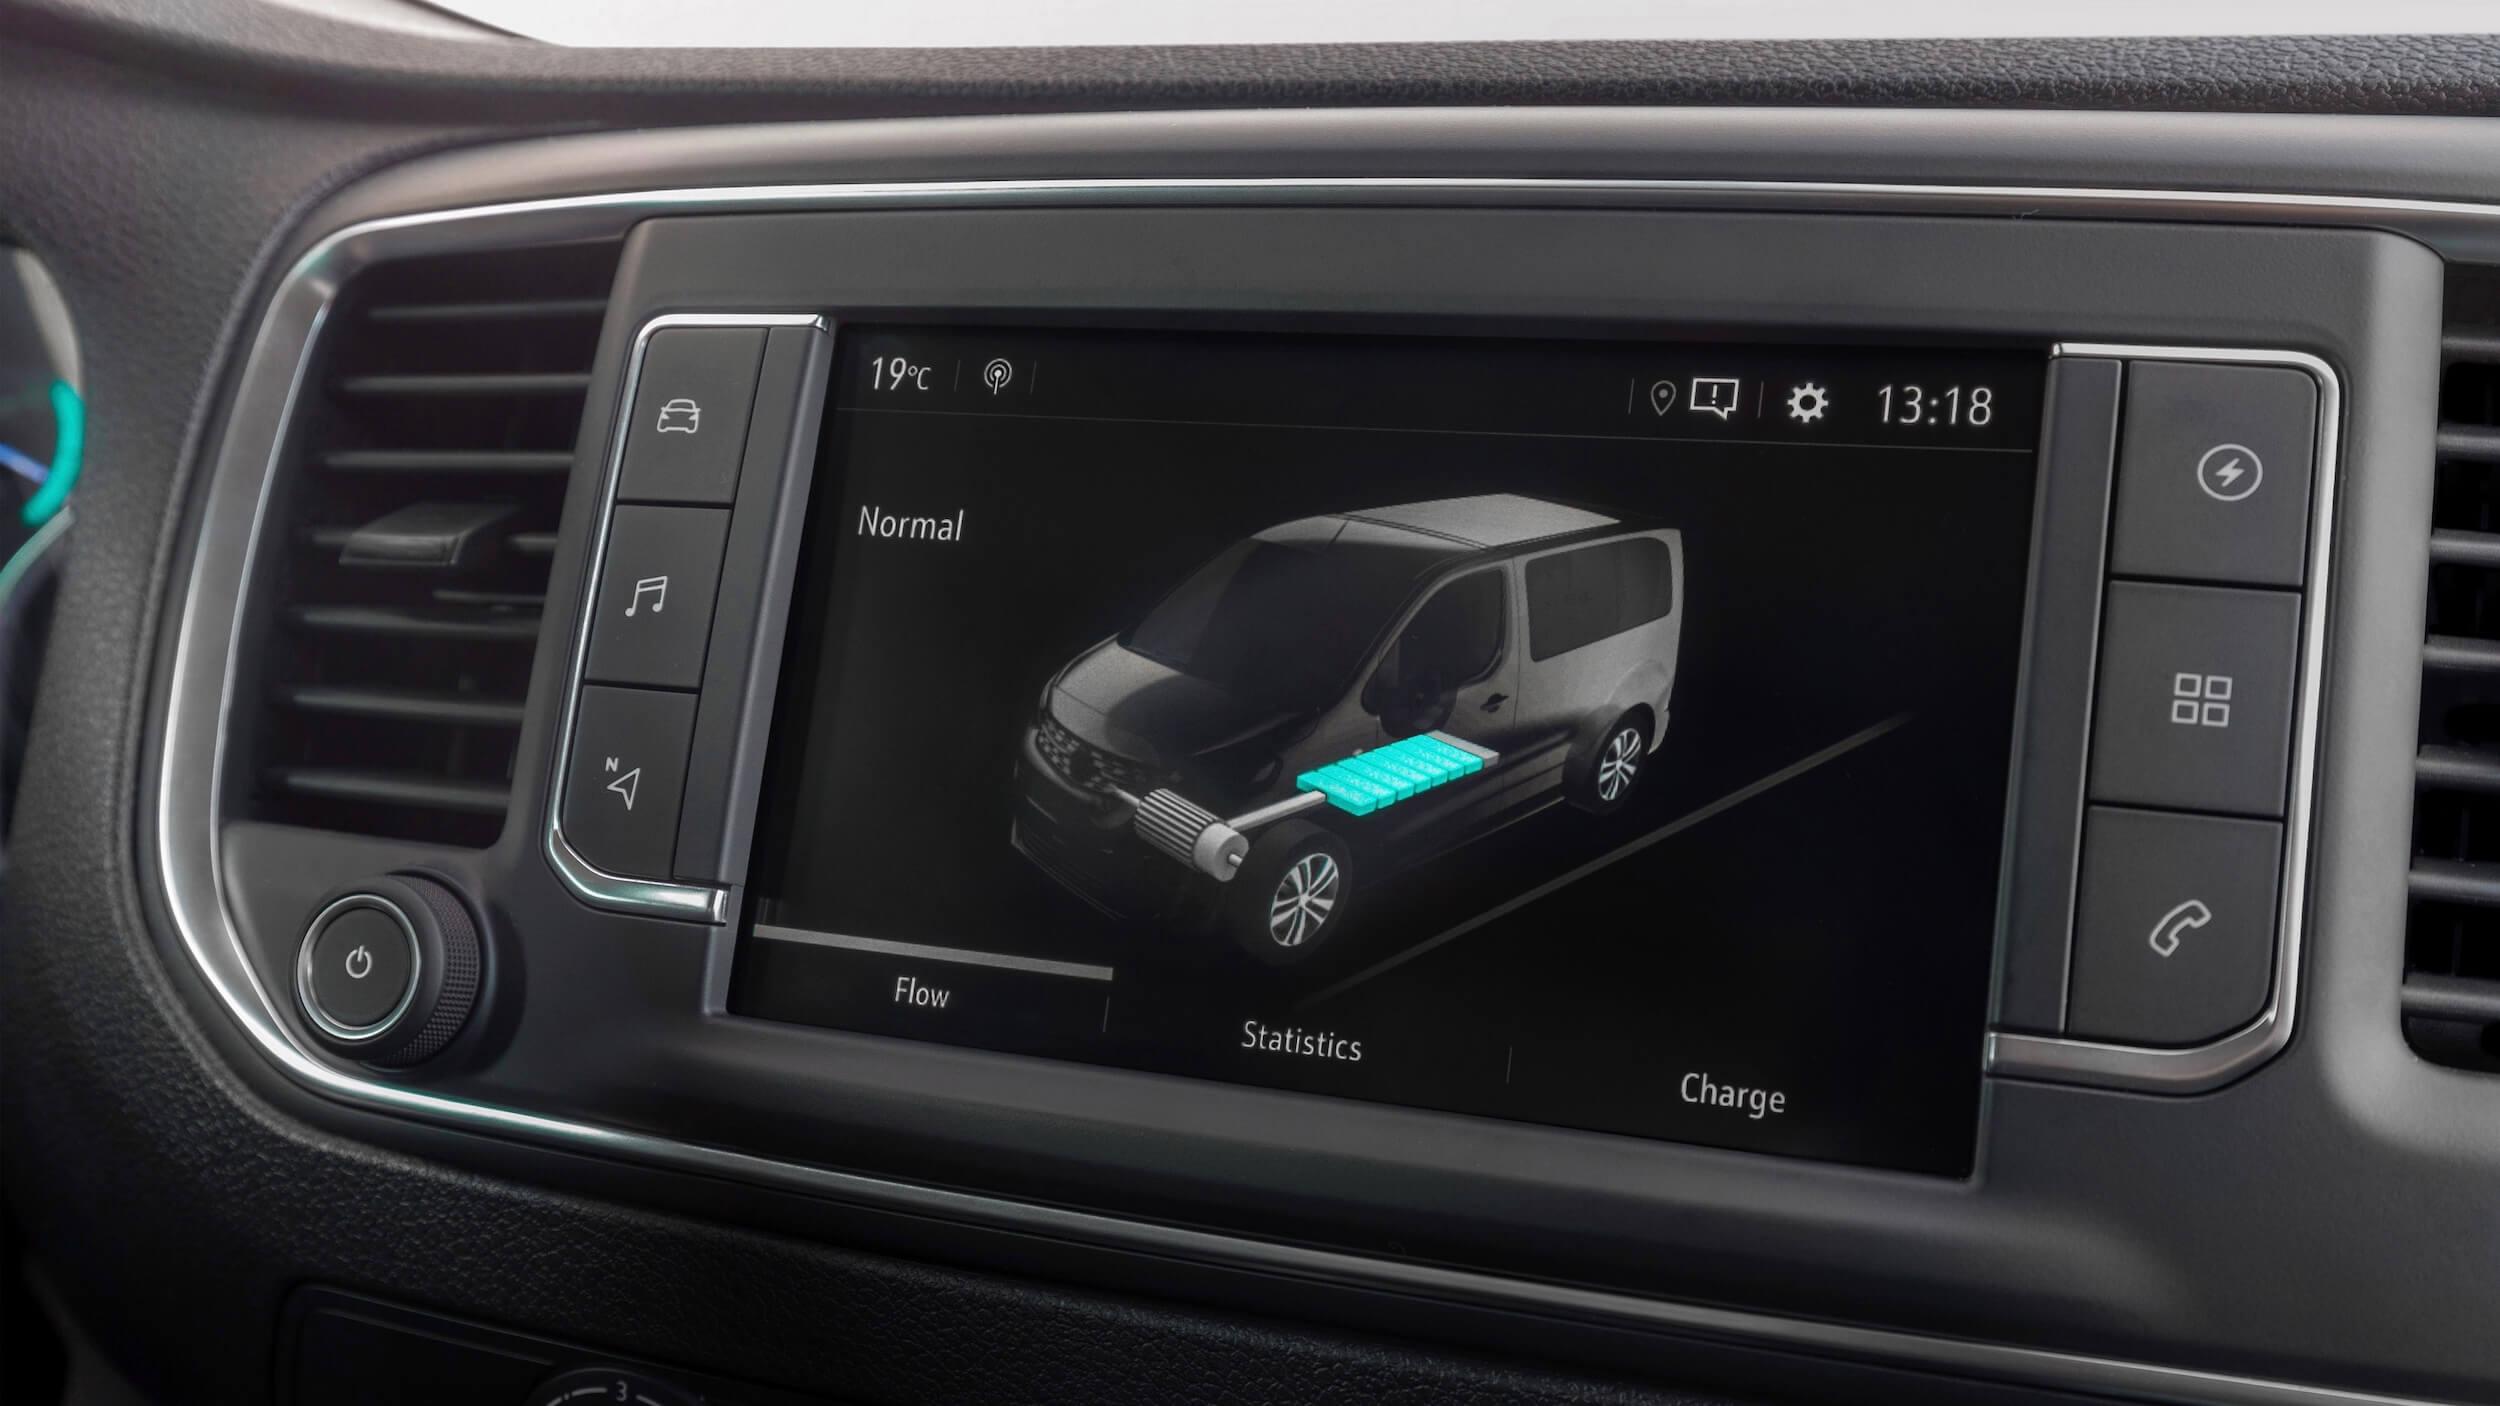 Opel Vivaro e infotainment scherm